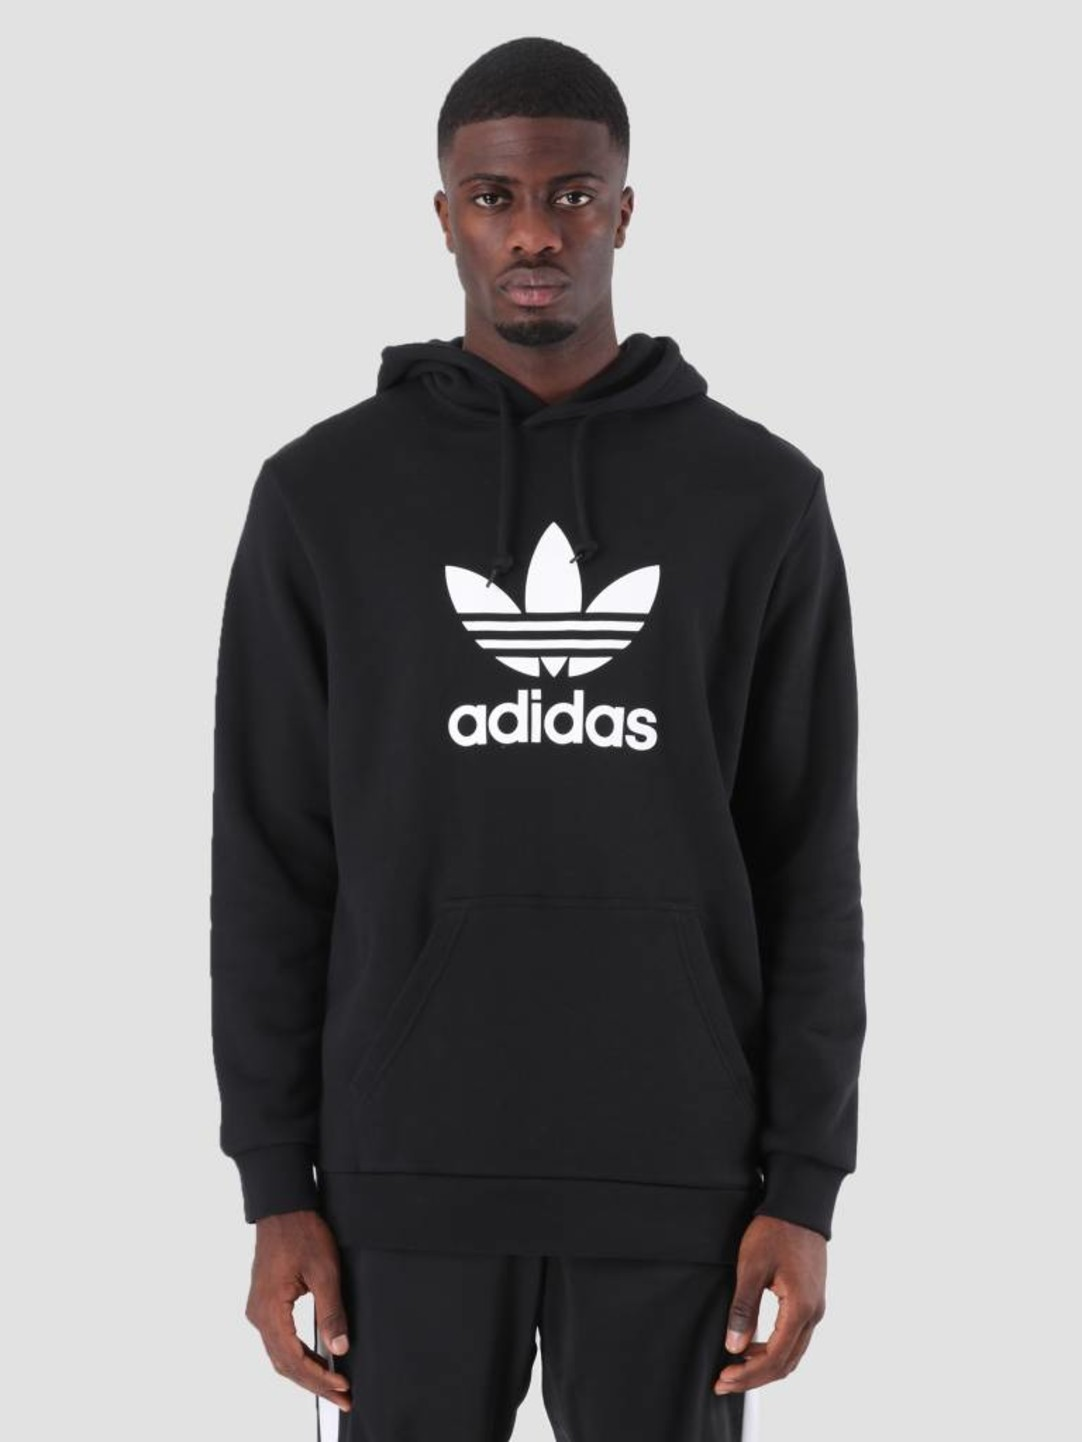 e4515f3d adidas Trefoil Hoodie Black DT7964 | FRESHCOTTON